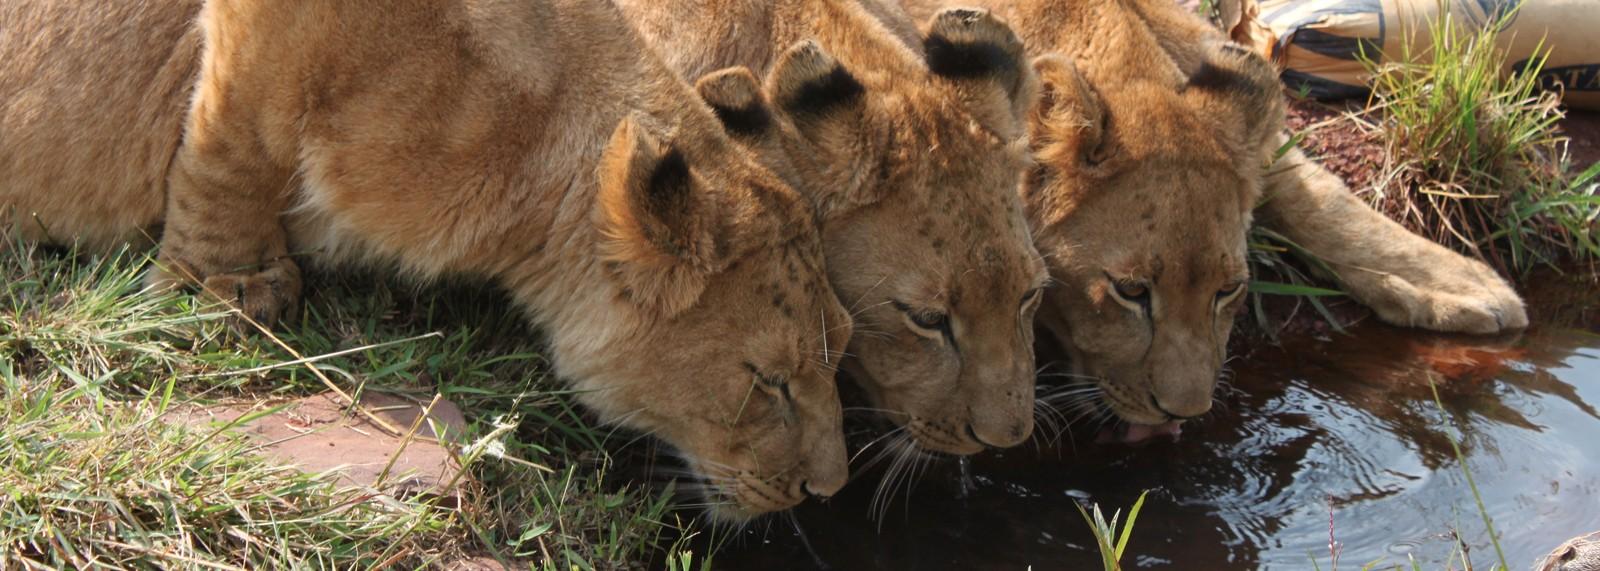 lions travel thrive communications pr